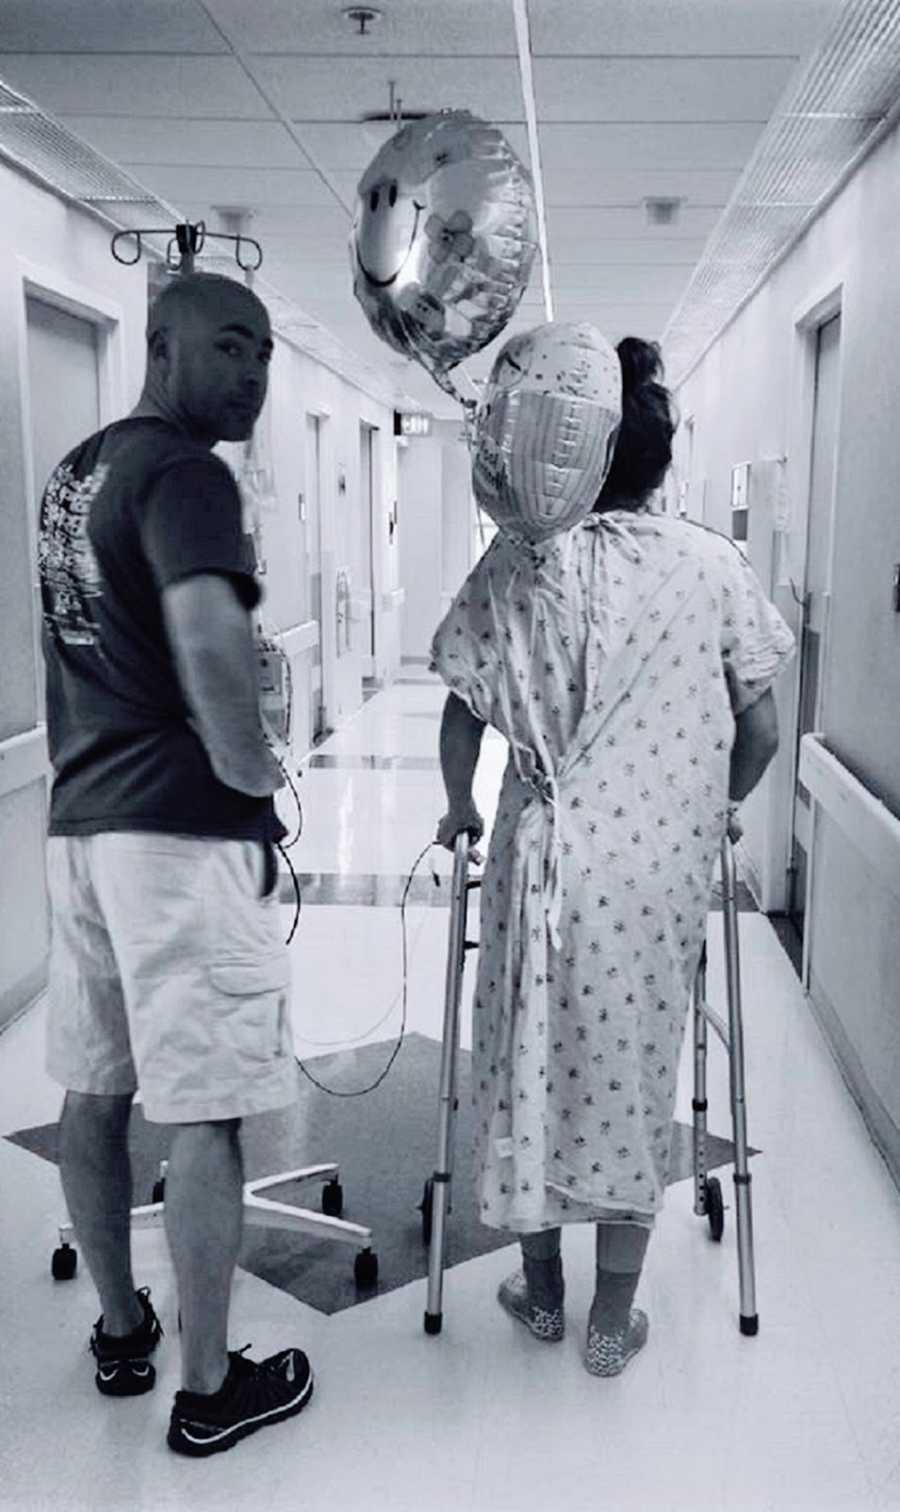 A man and a woman walk down a hospital corridor